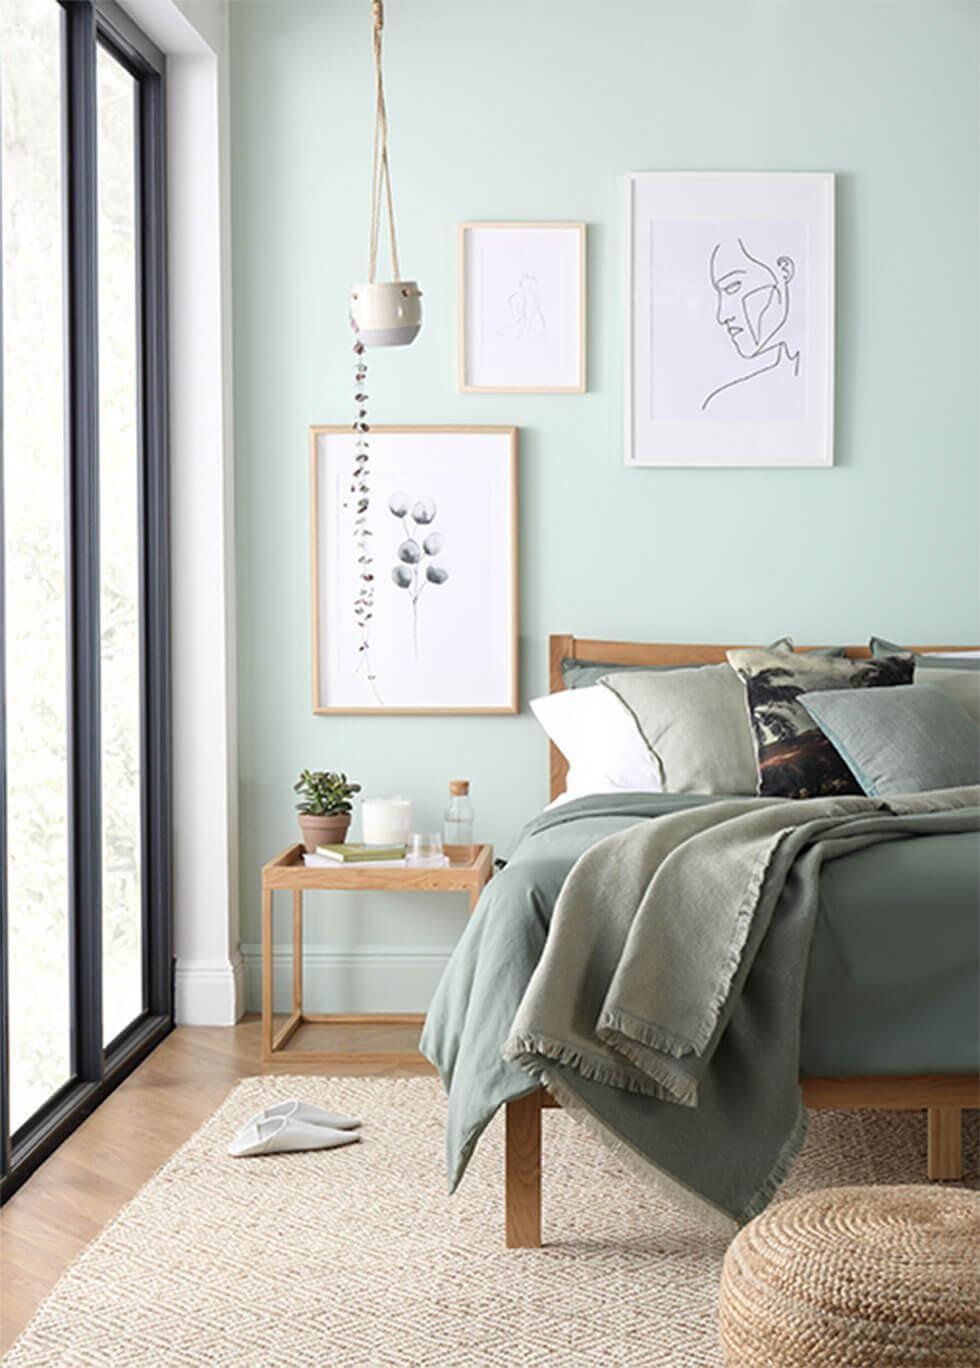 7 Ways To Make A Green Bedroom Look Good | Inspira